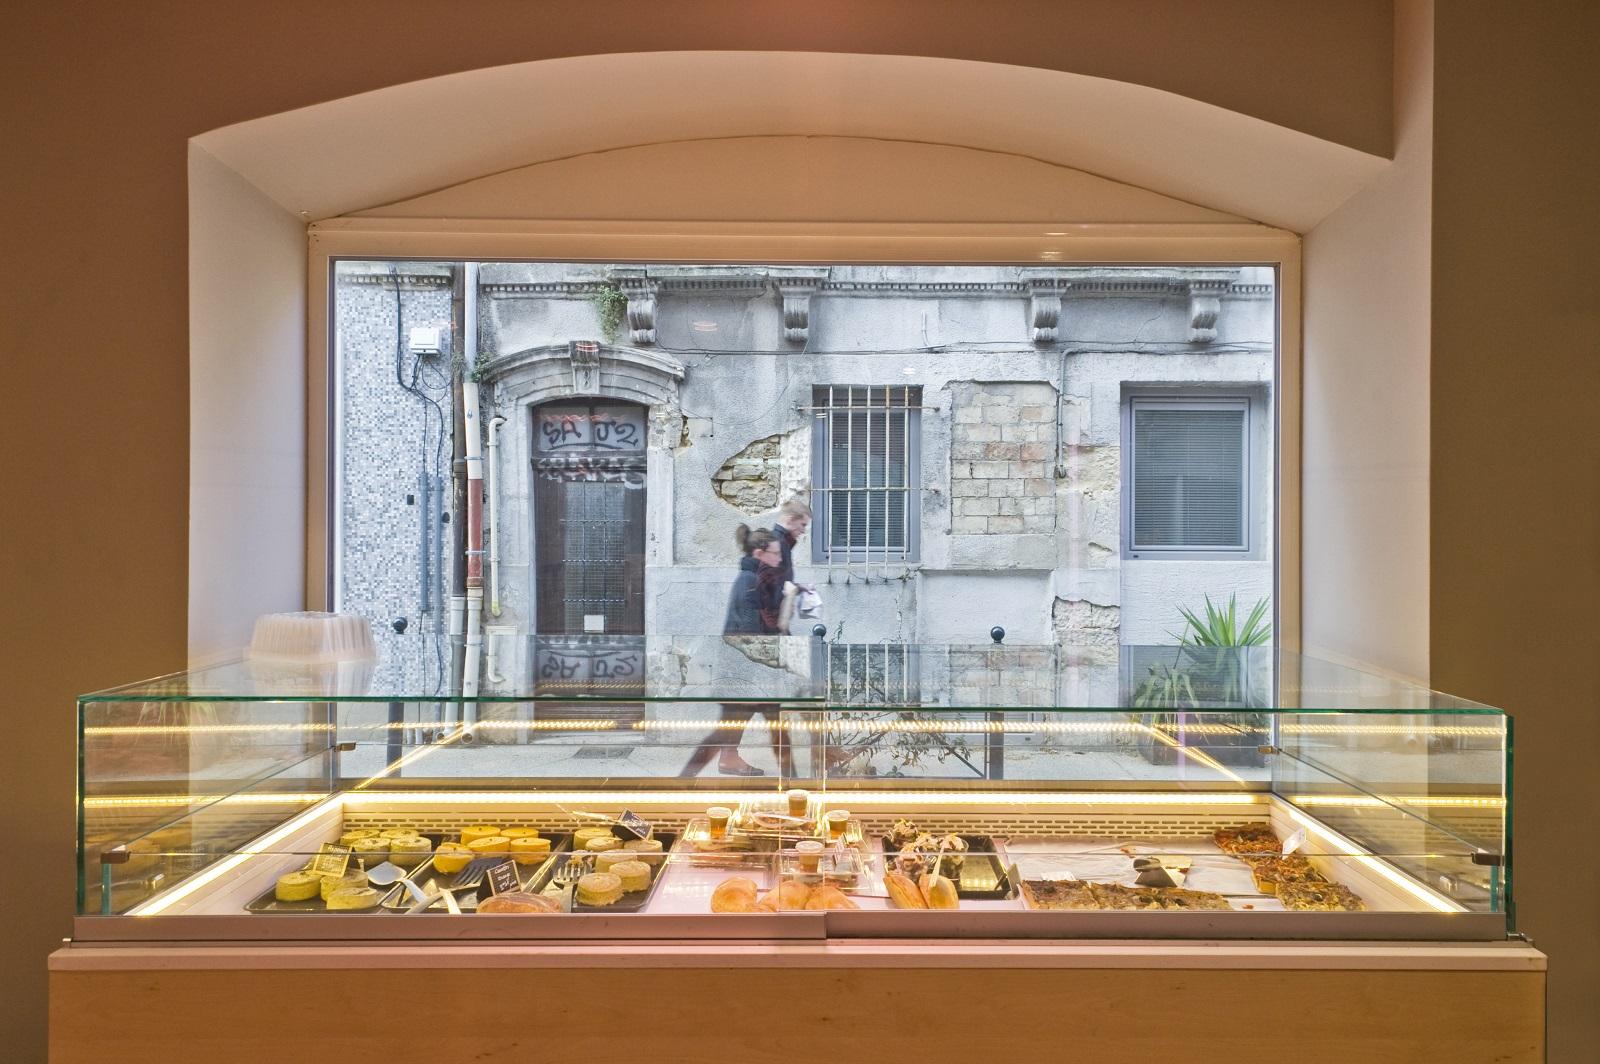 NAKIDE-Boucherie-Patrick Puel-agencement-vitrine-refrigeree-cruz-traiteur